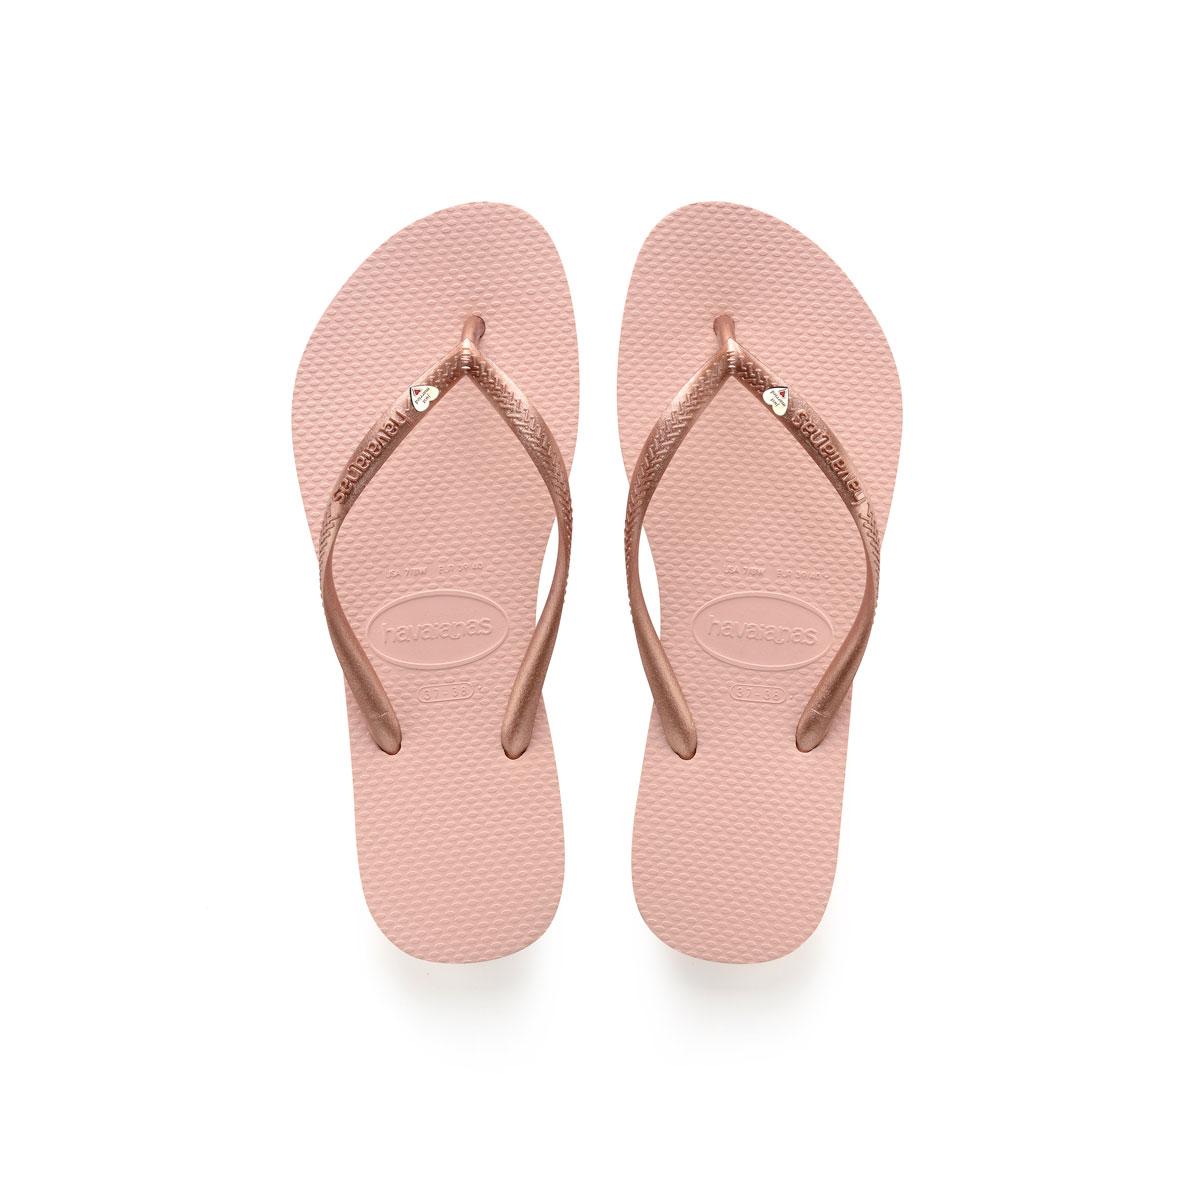 Heart Silver Charm Havaianas Ballet Rose Wedding Personalised Flip Flops